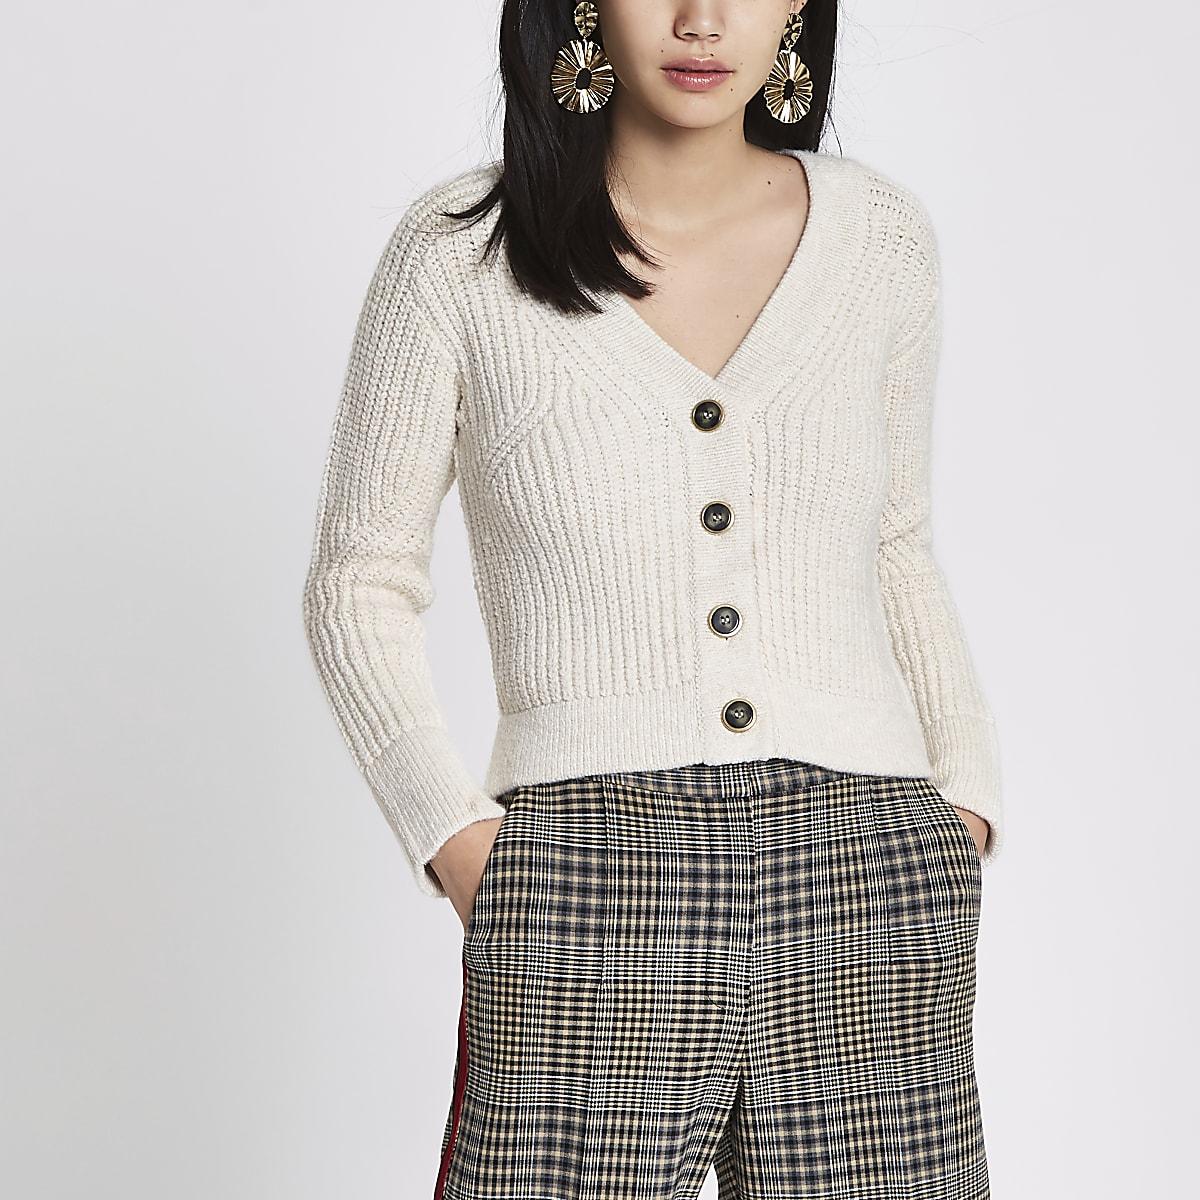 Beige knit long sleeve cropped cardigan